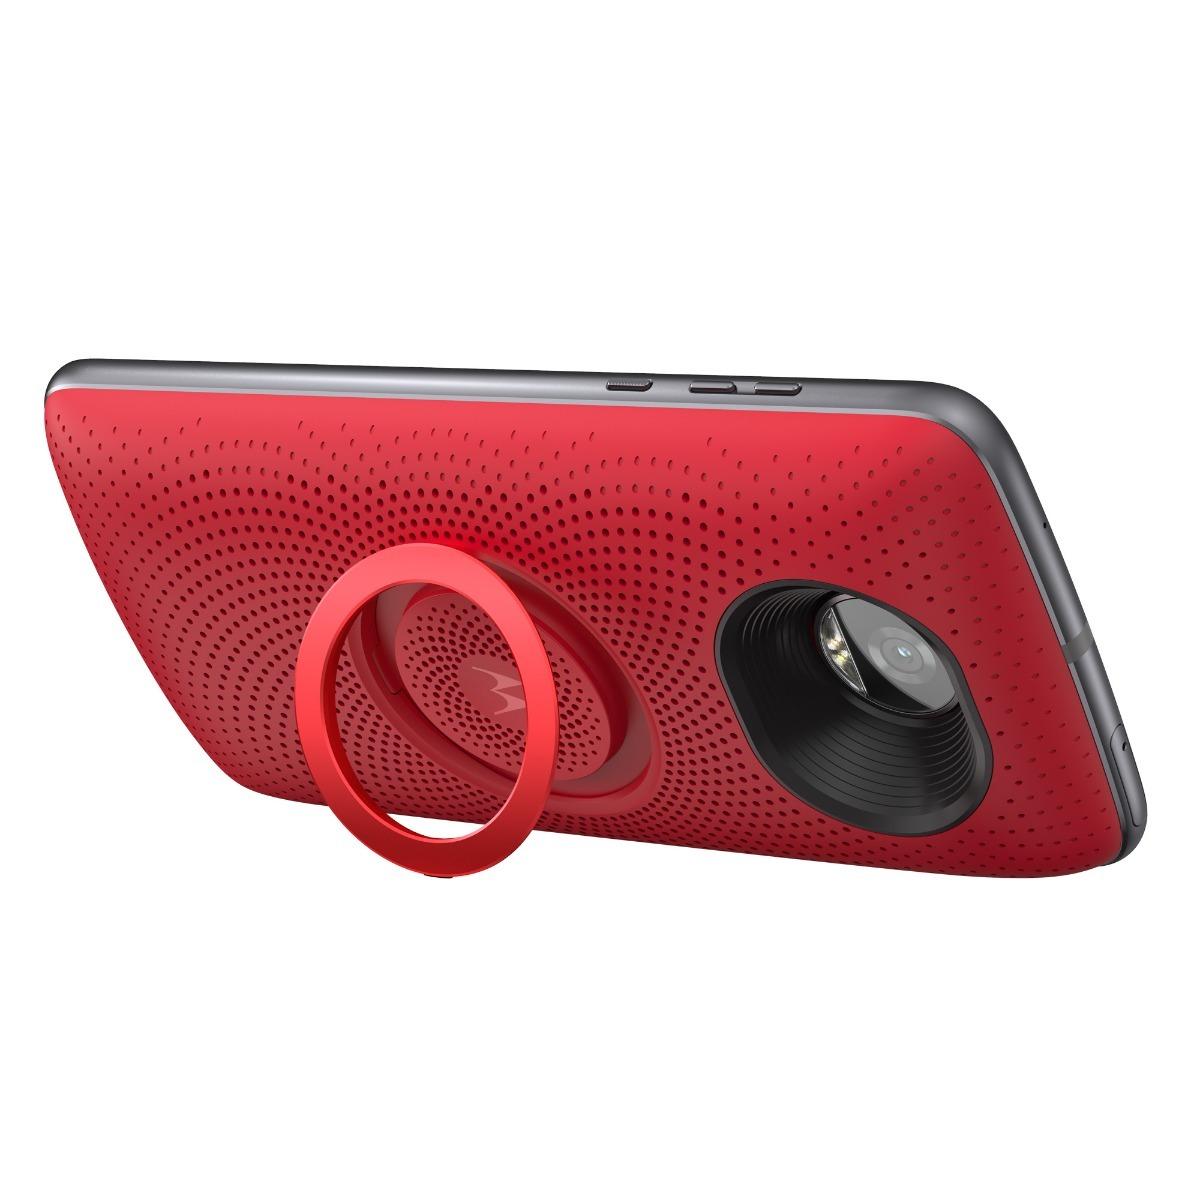 Moto Mod Motorola Bocina Jbl Roja